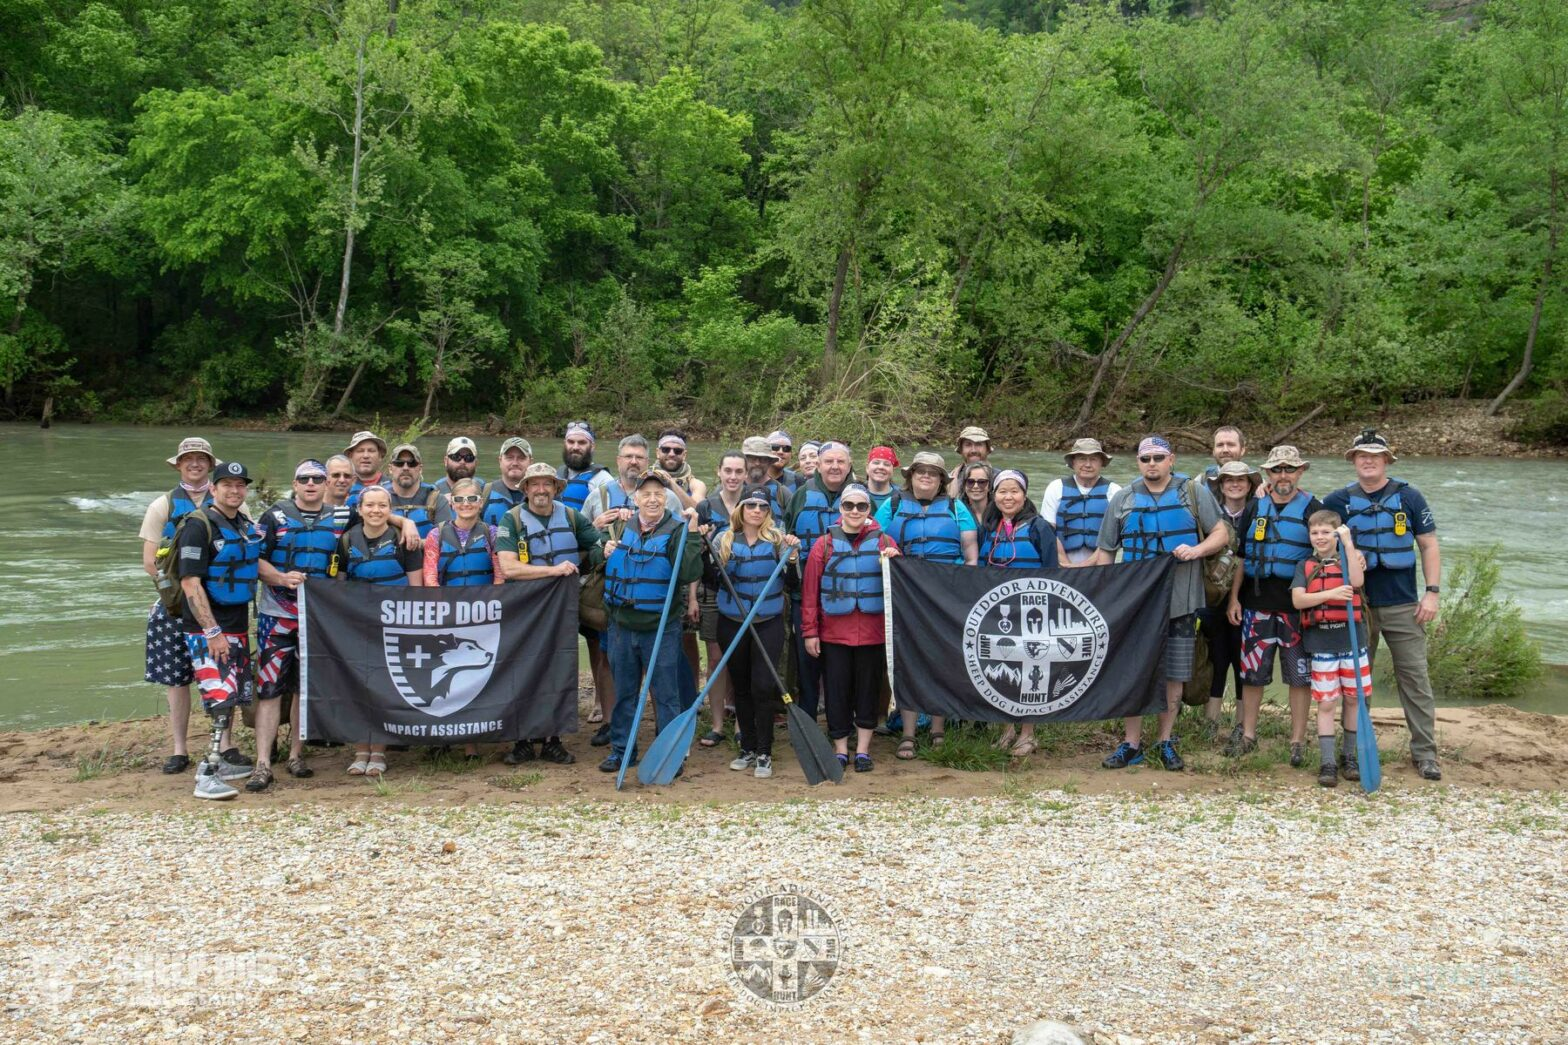 SDIA Outdoor Adventures Inspire Veterans, First Responders to #GetOffTheCouch